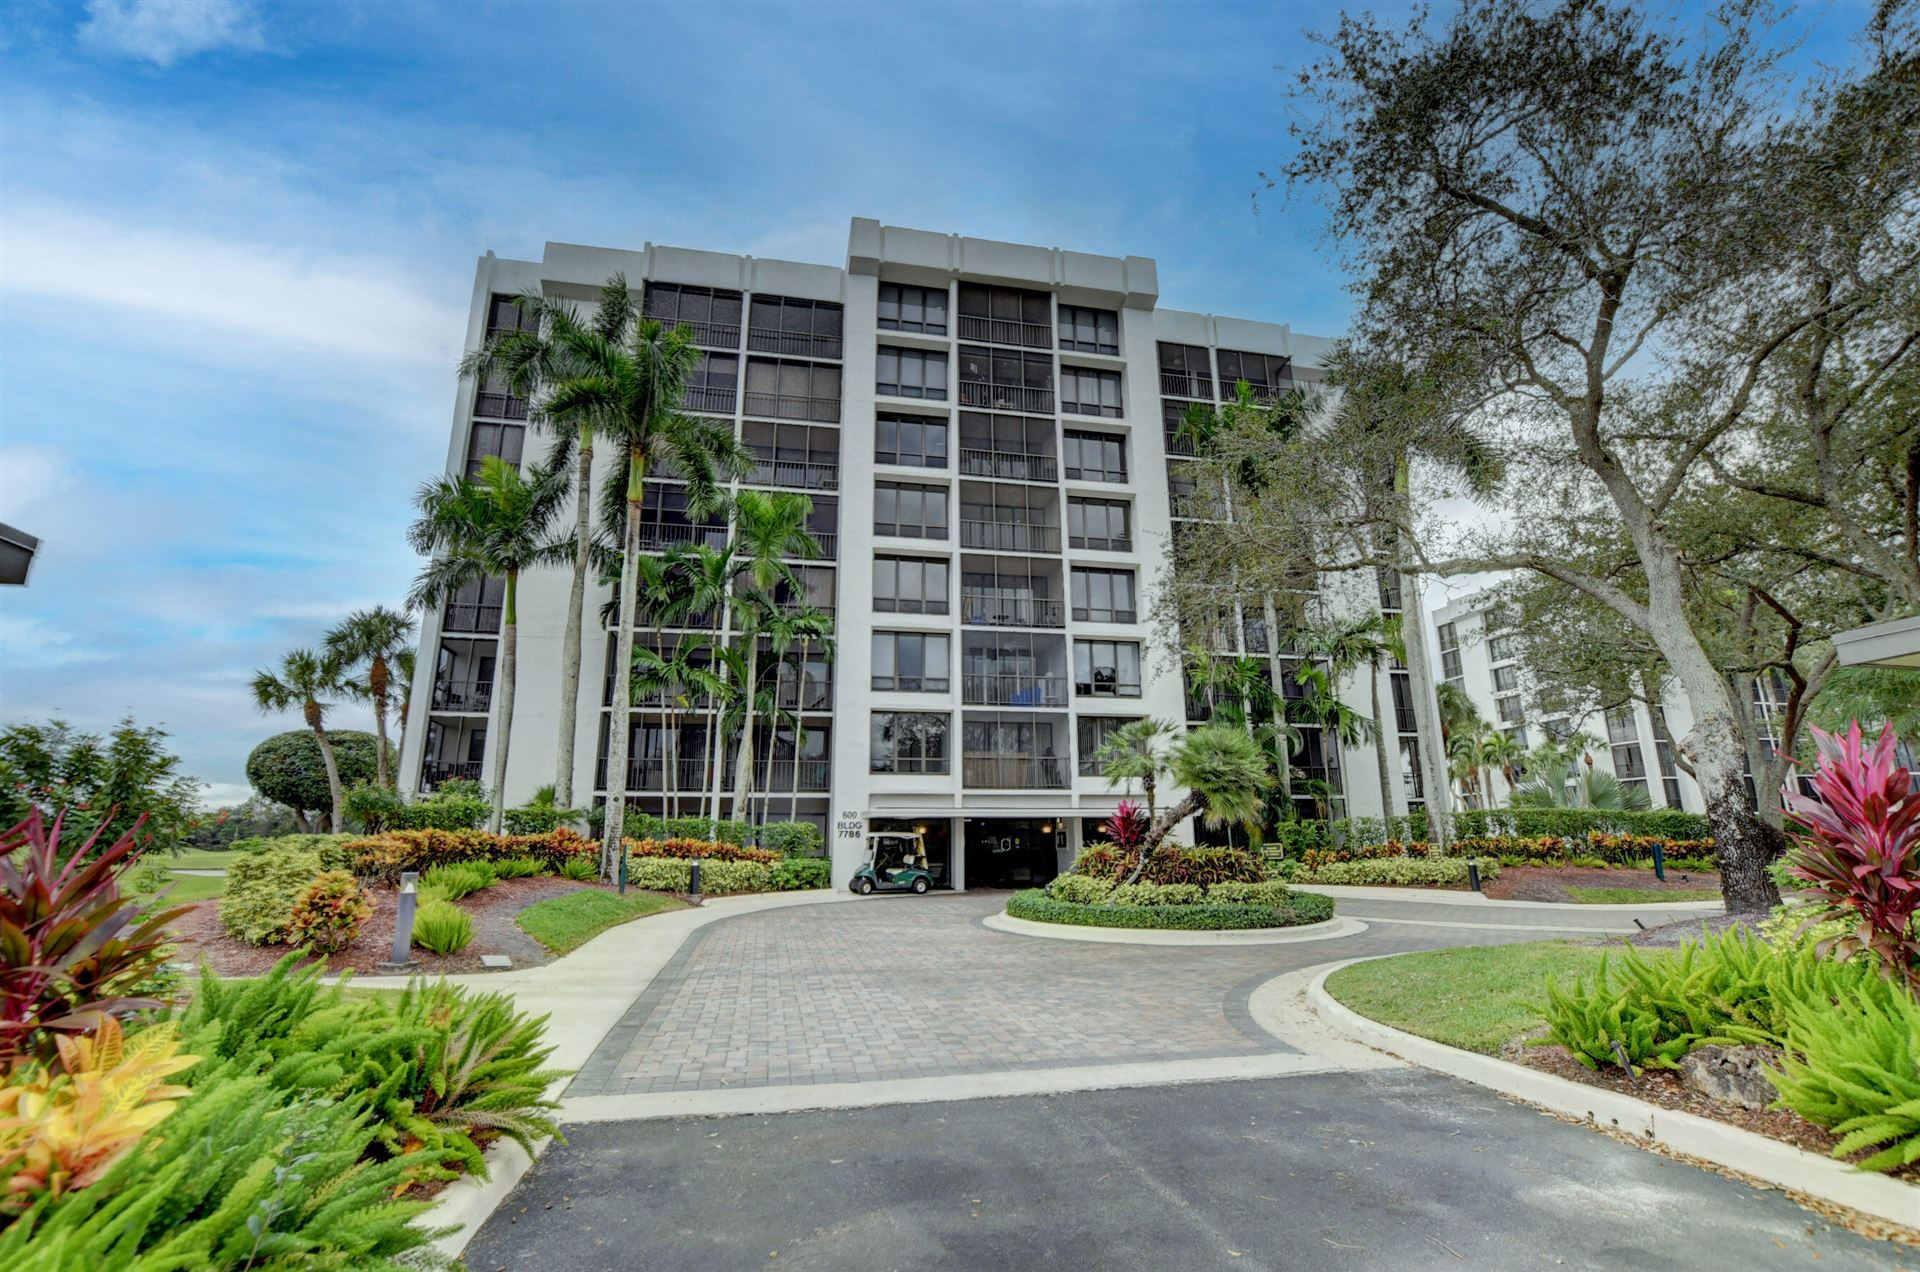 7786 Lakeside Boulevard #666, Boca Raton, FL 33434 - MLS#: RX-10577910